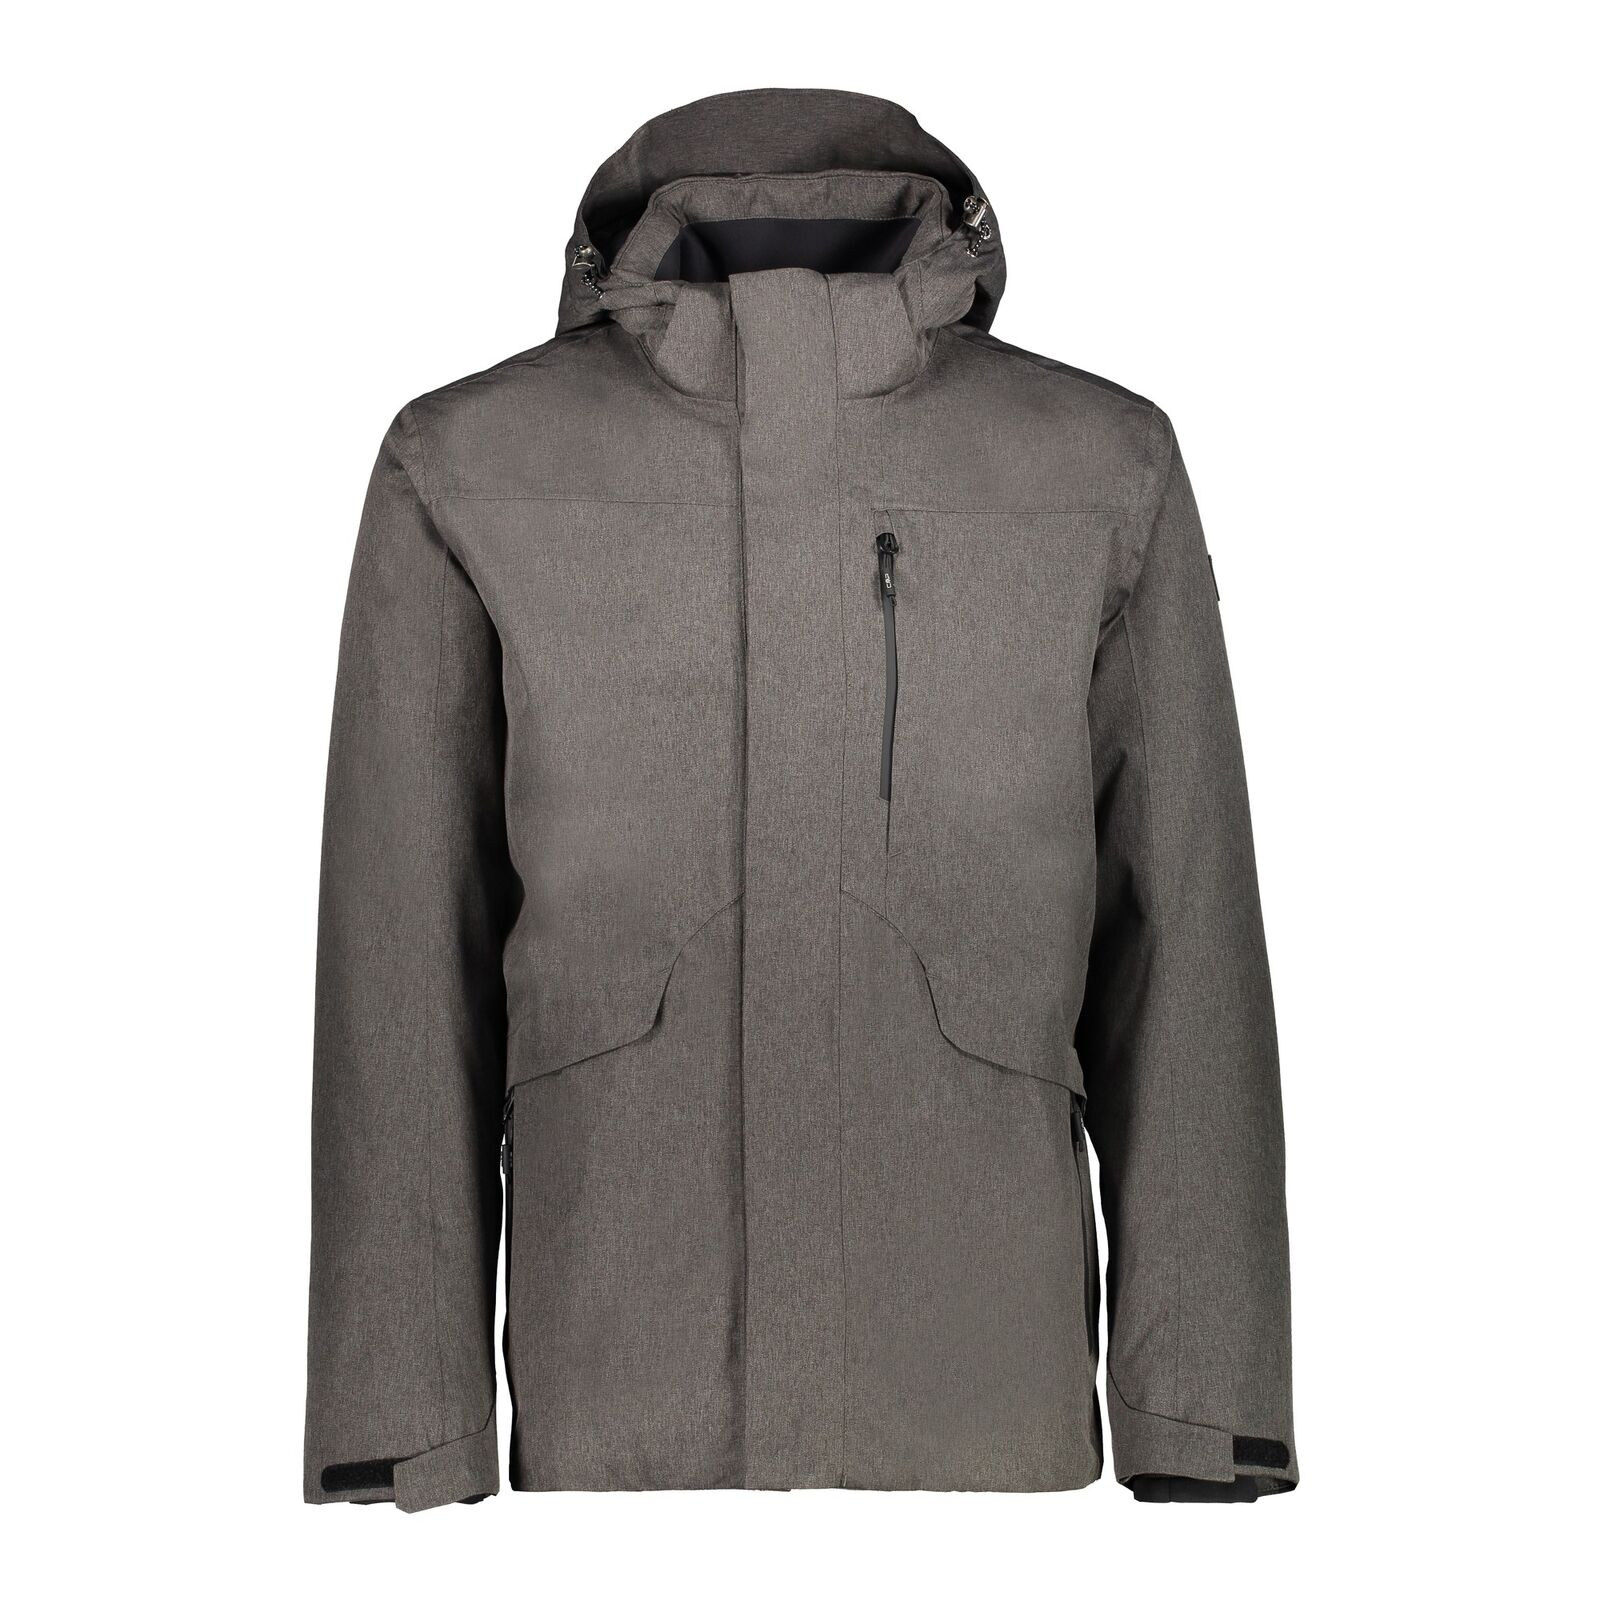 CMP hidrófuga chaqueta man long Jacket ZIP Hood marrón viento denso